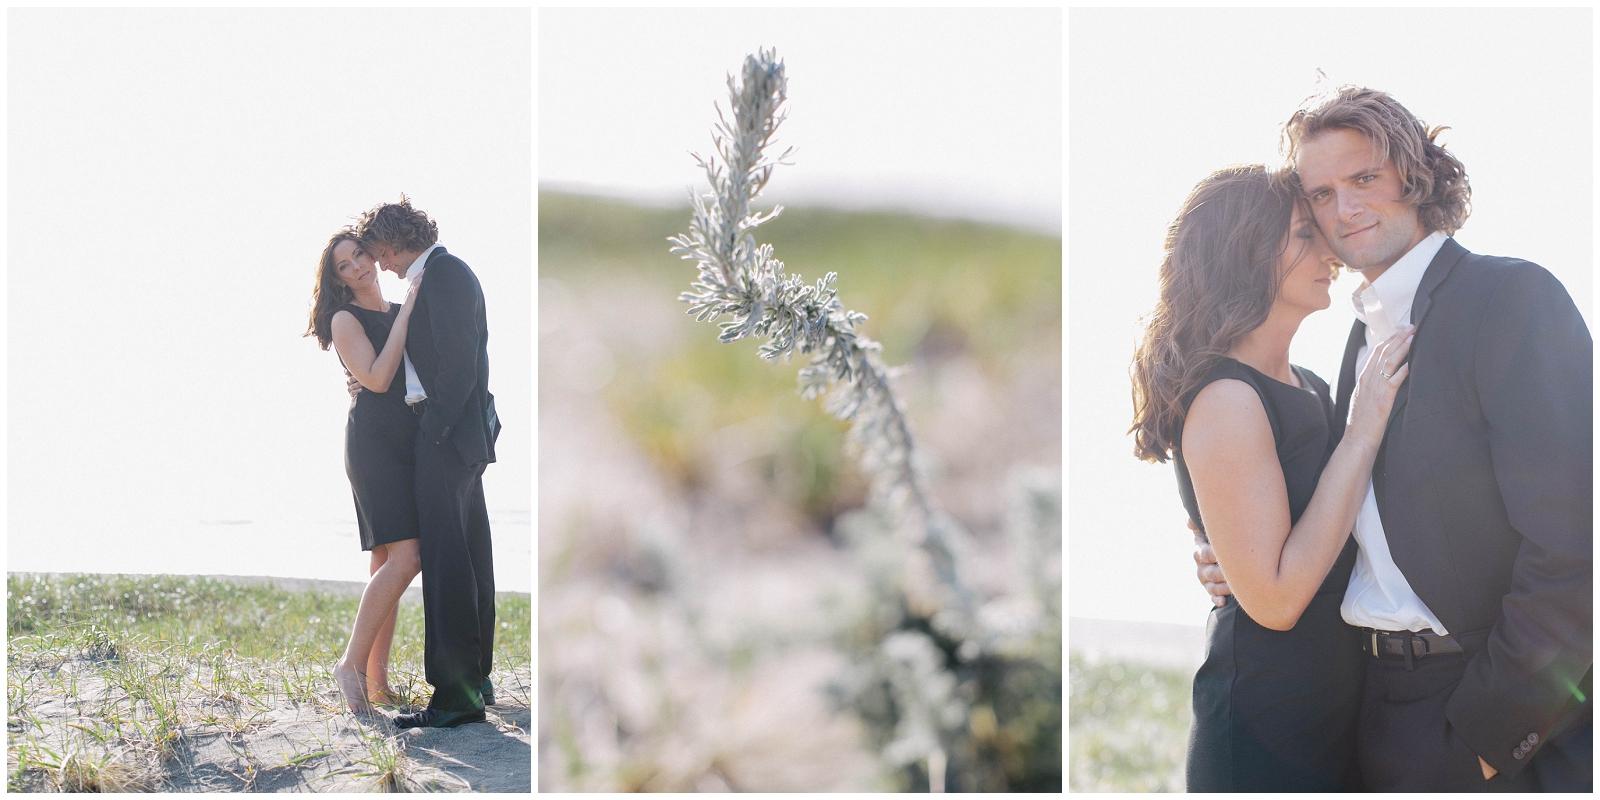 San-Francisco-Bay-Area-Wedding-Photography-Engagement-California-Coast-12.jpg